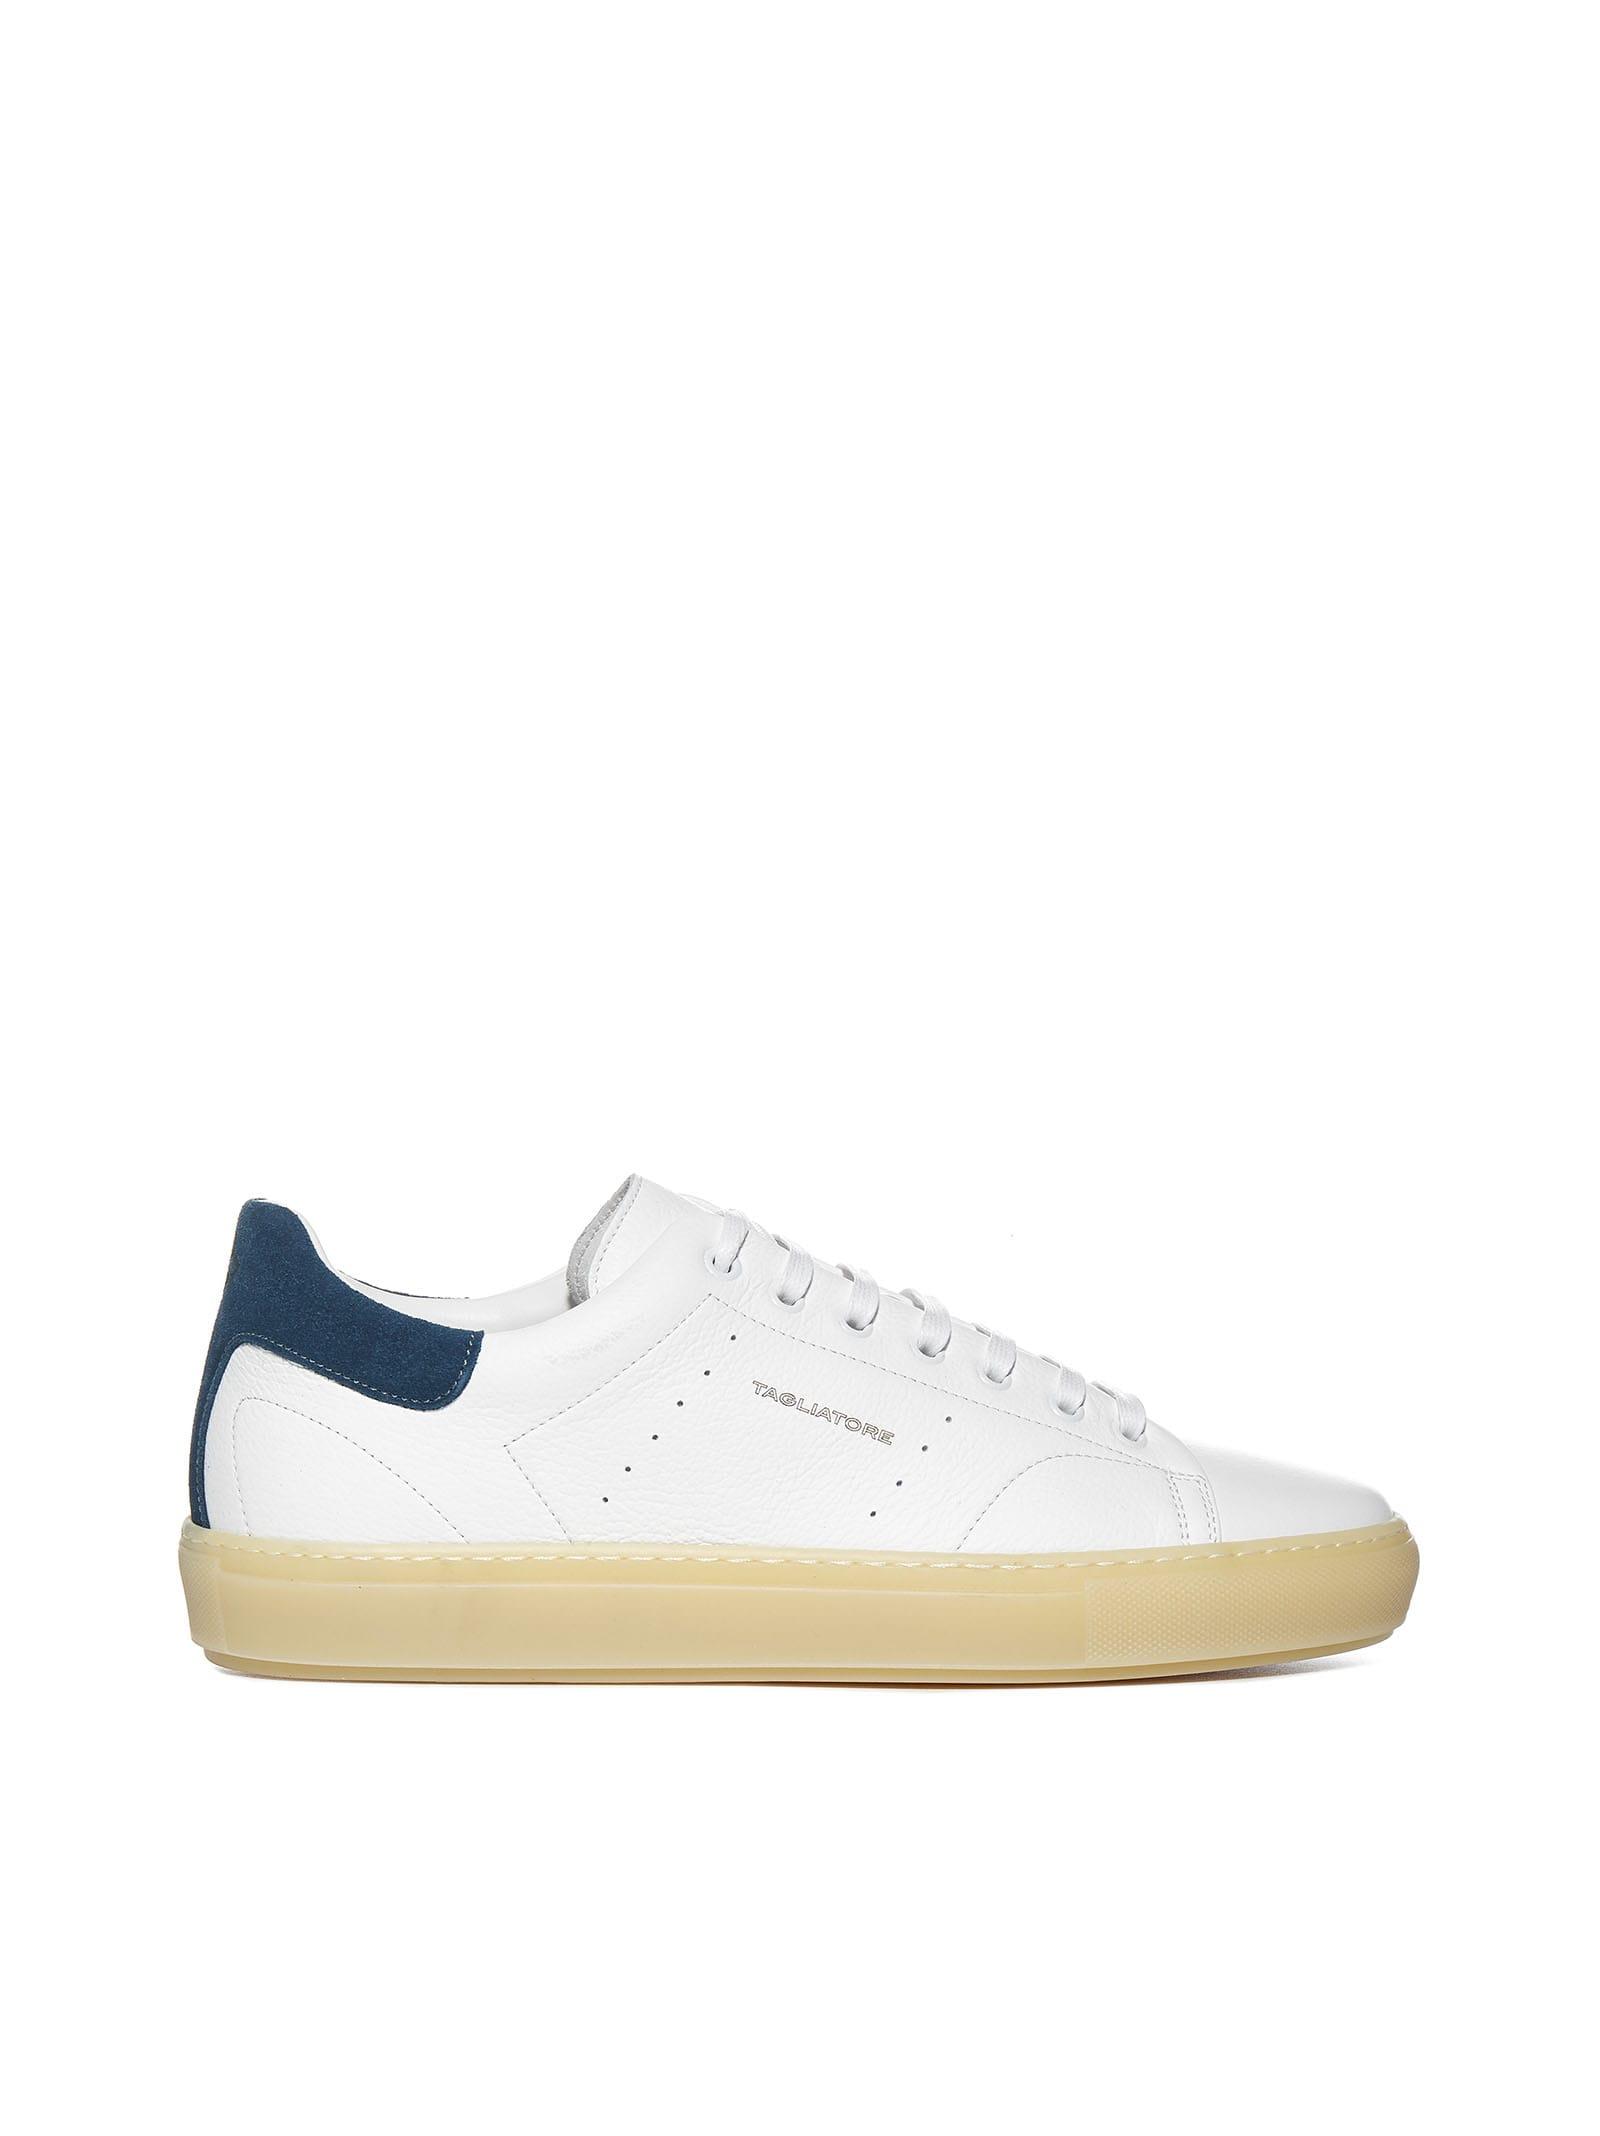 Tagliatore Sneakers